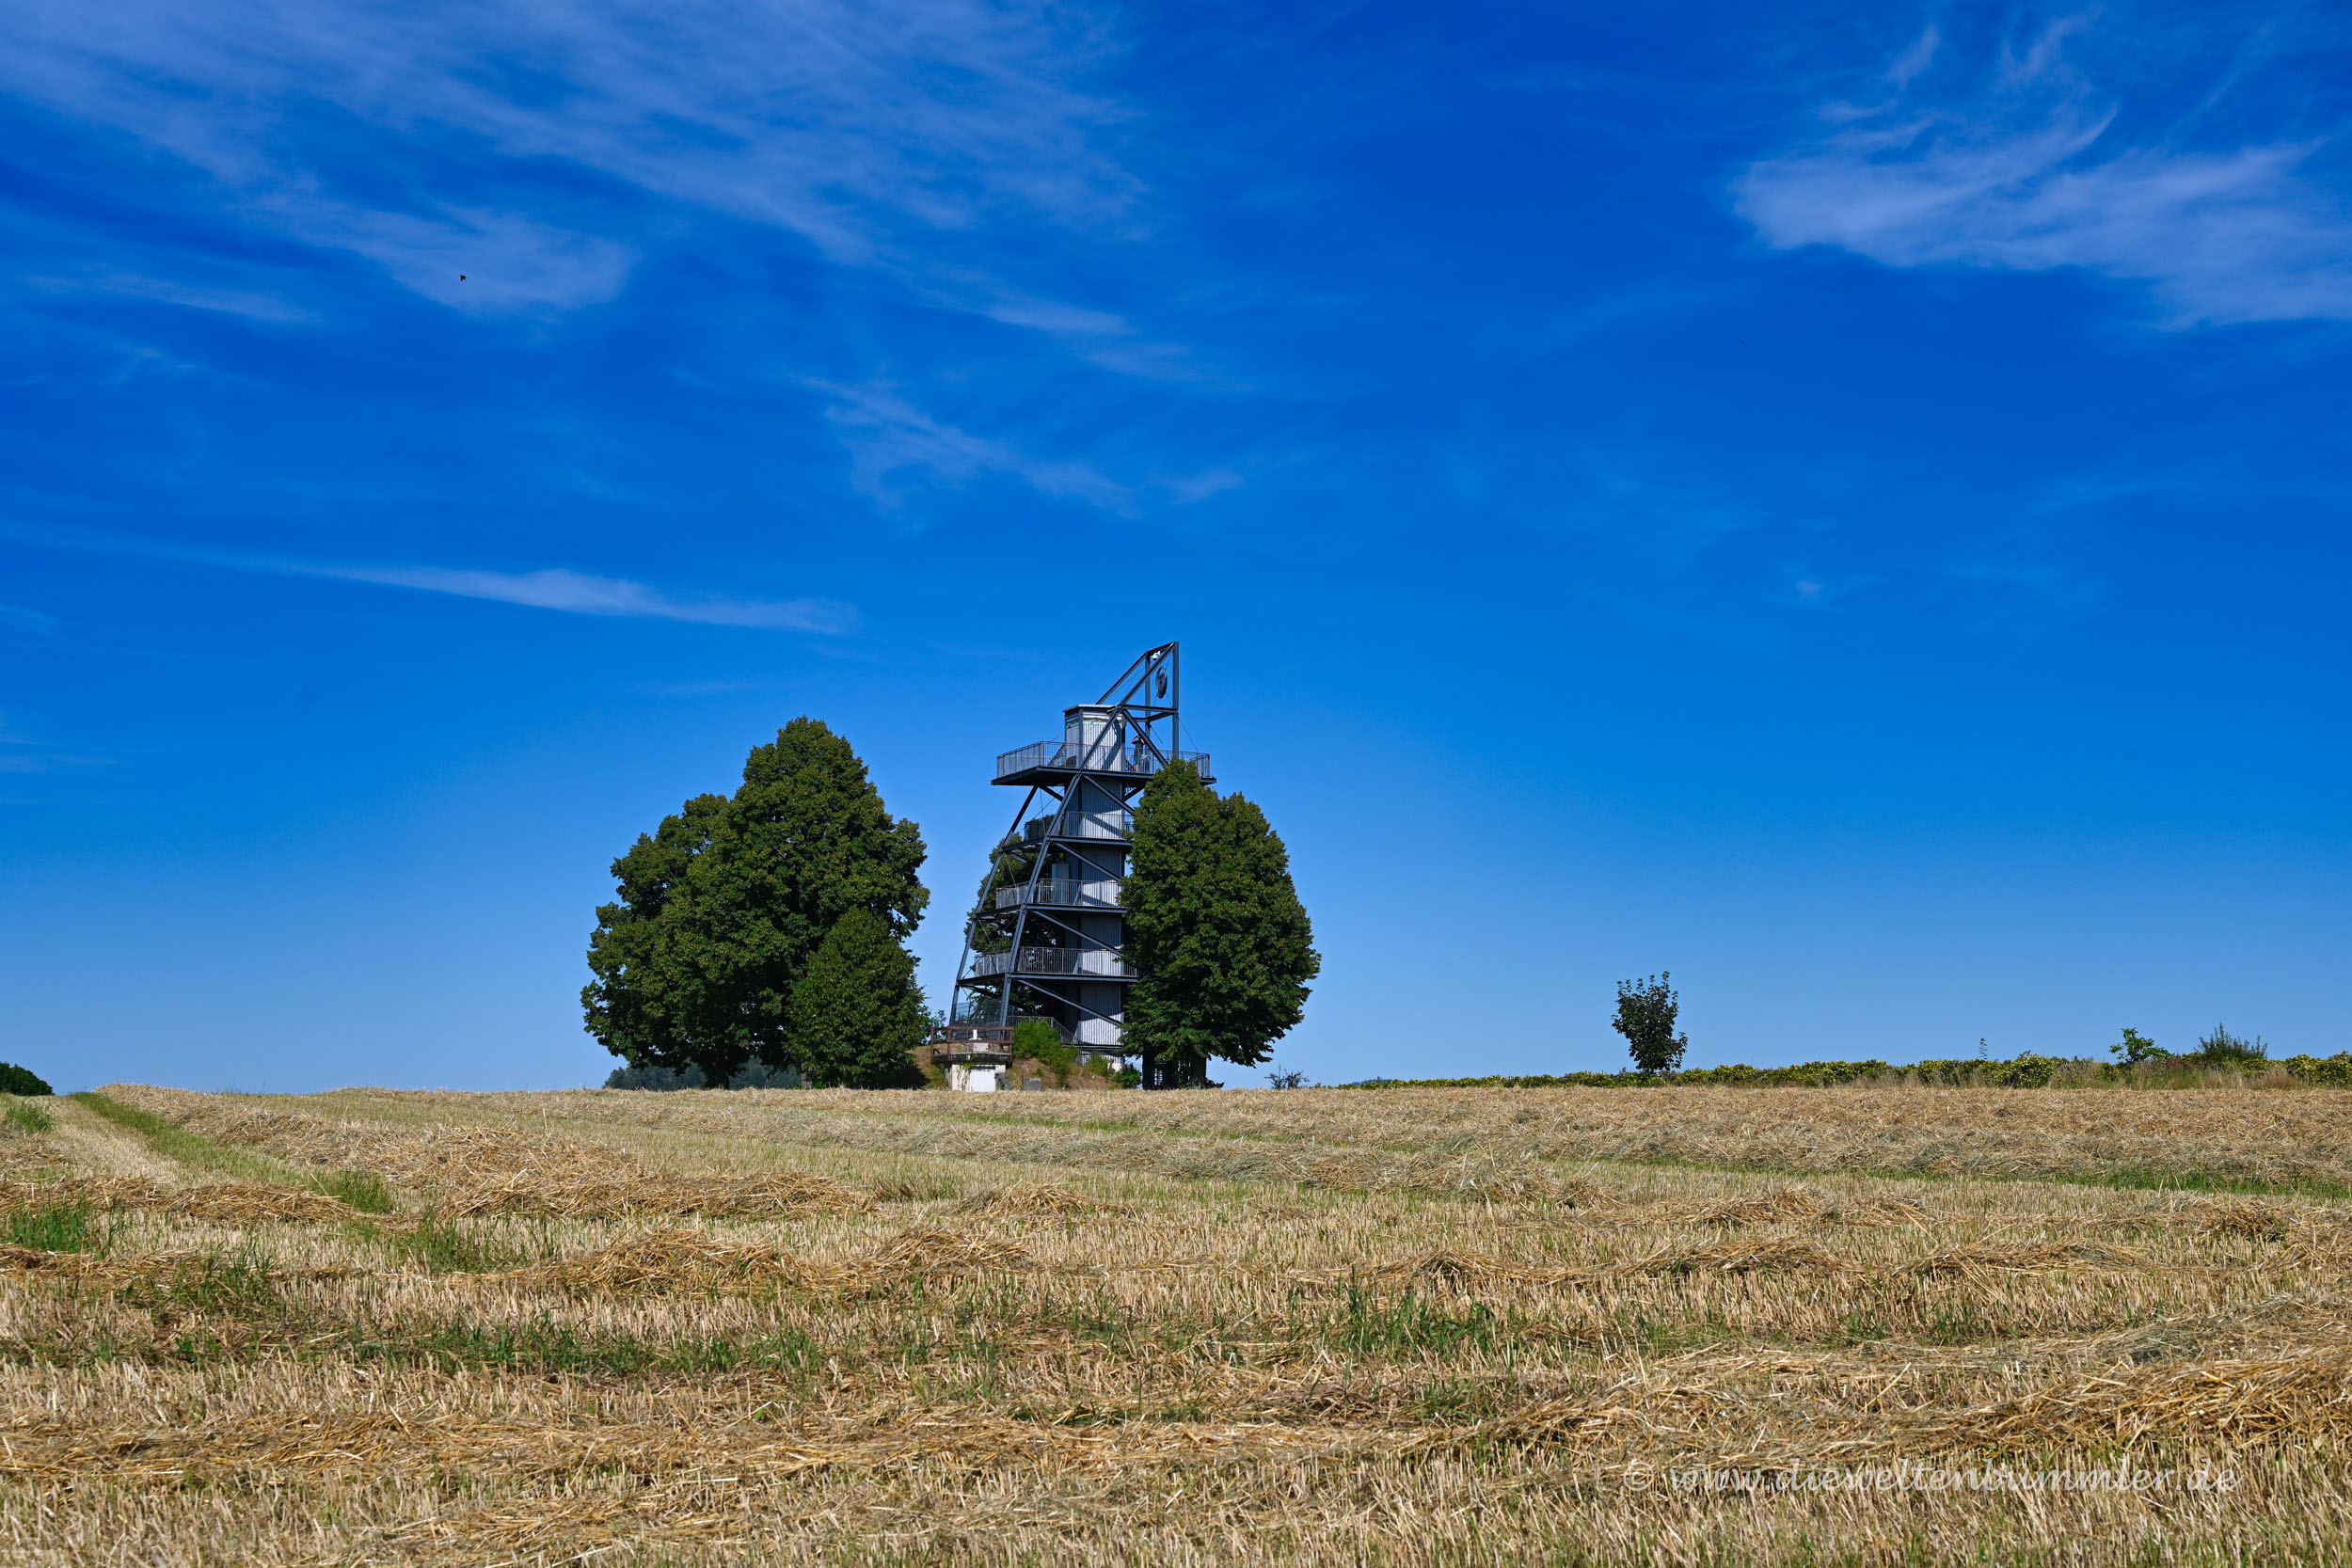 Turm in Rathmannsdorf